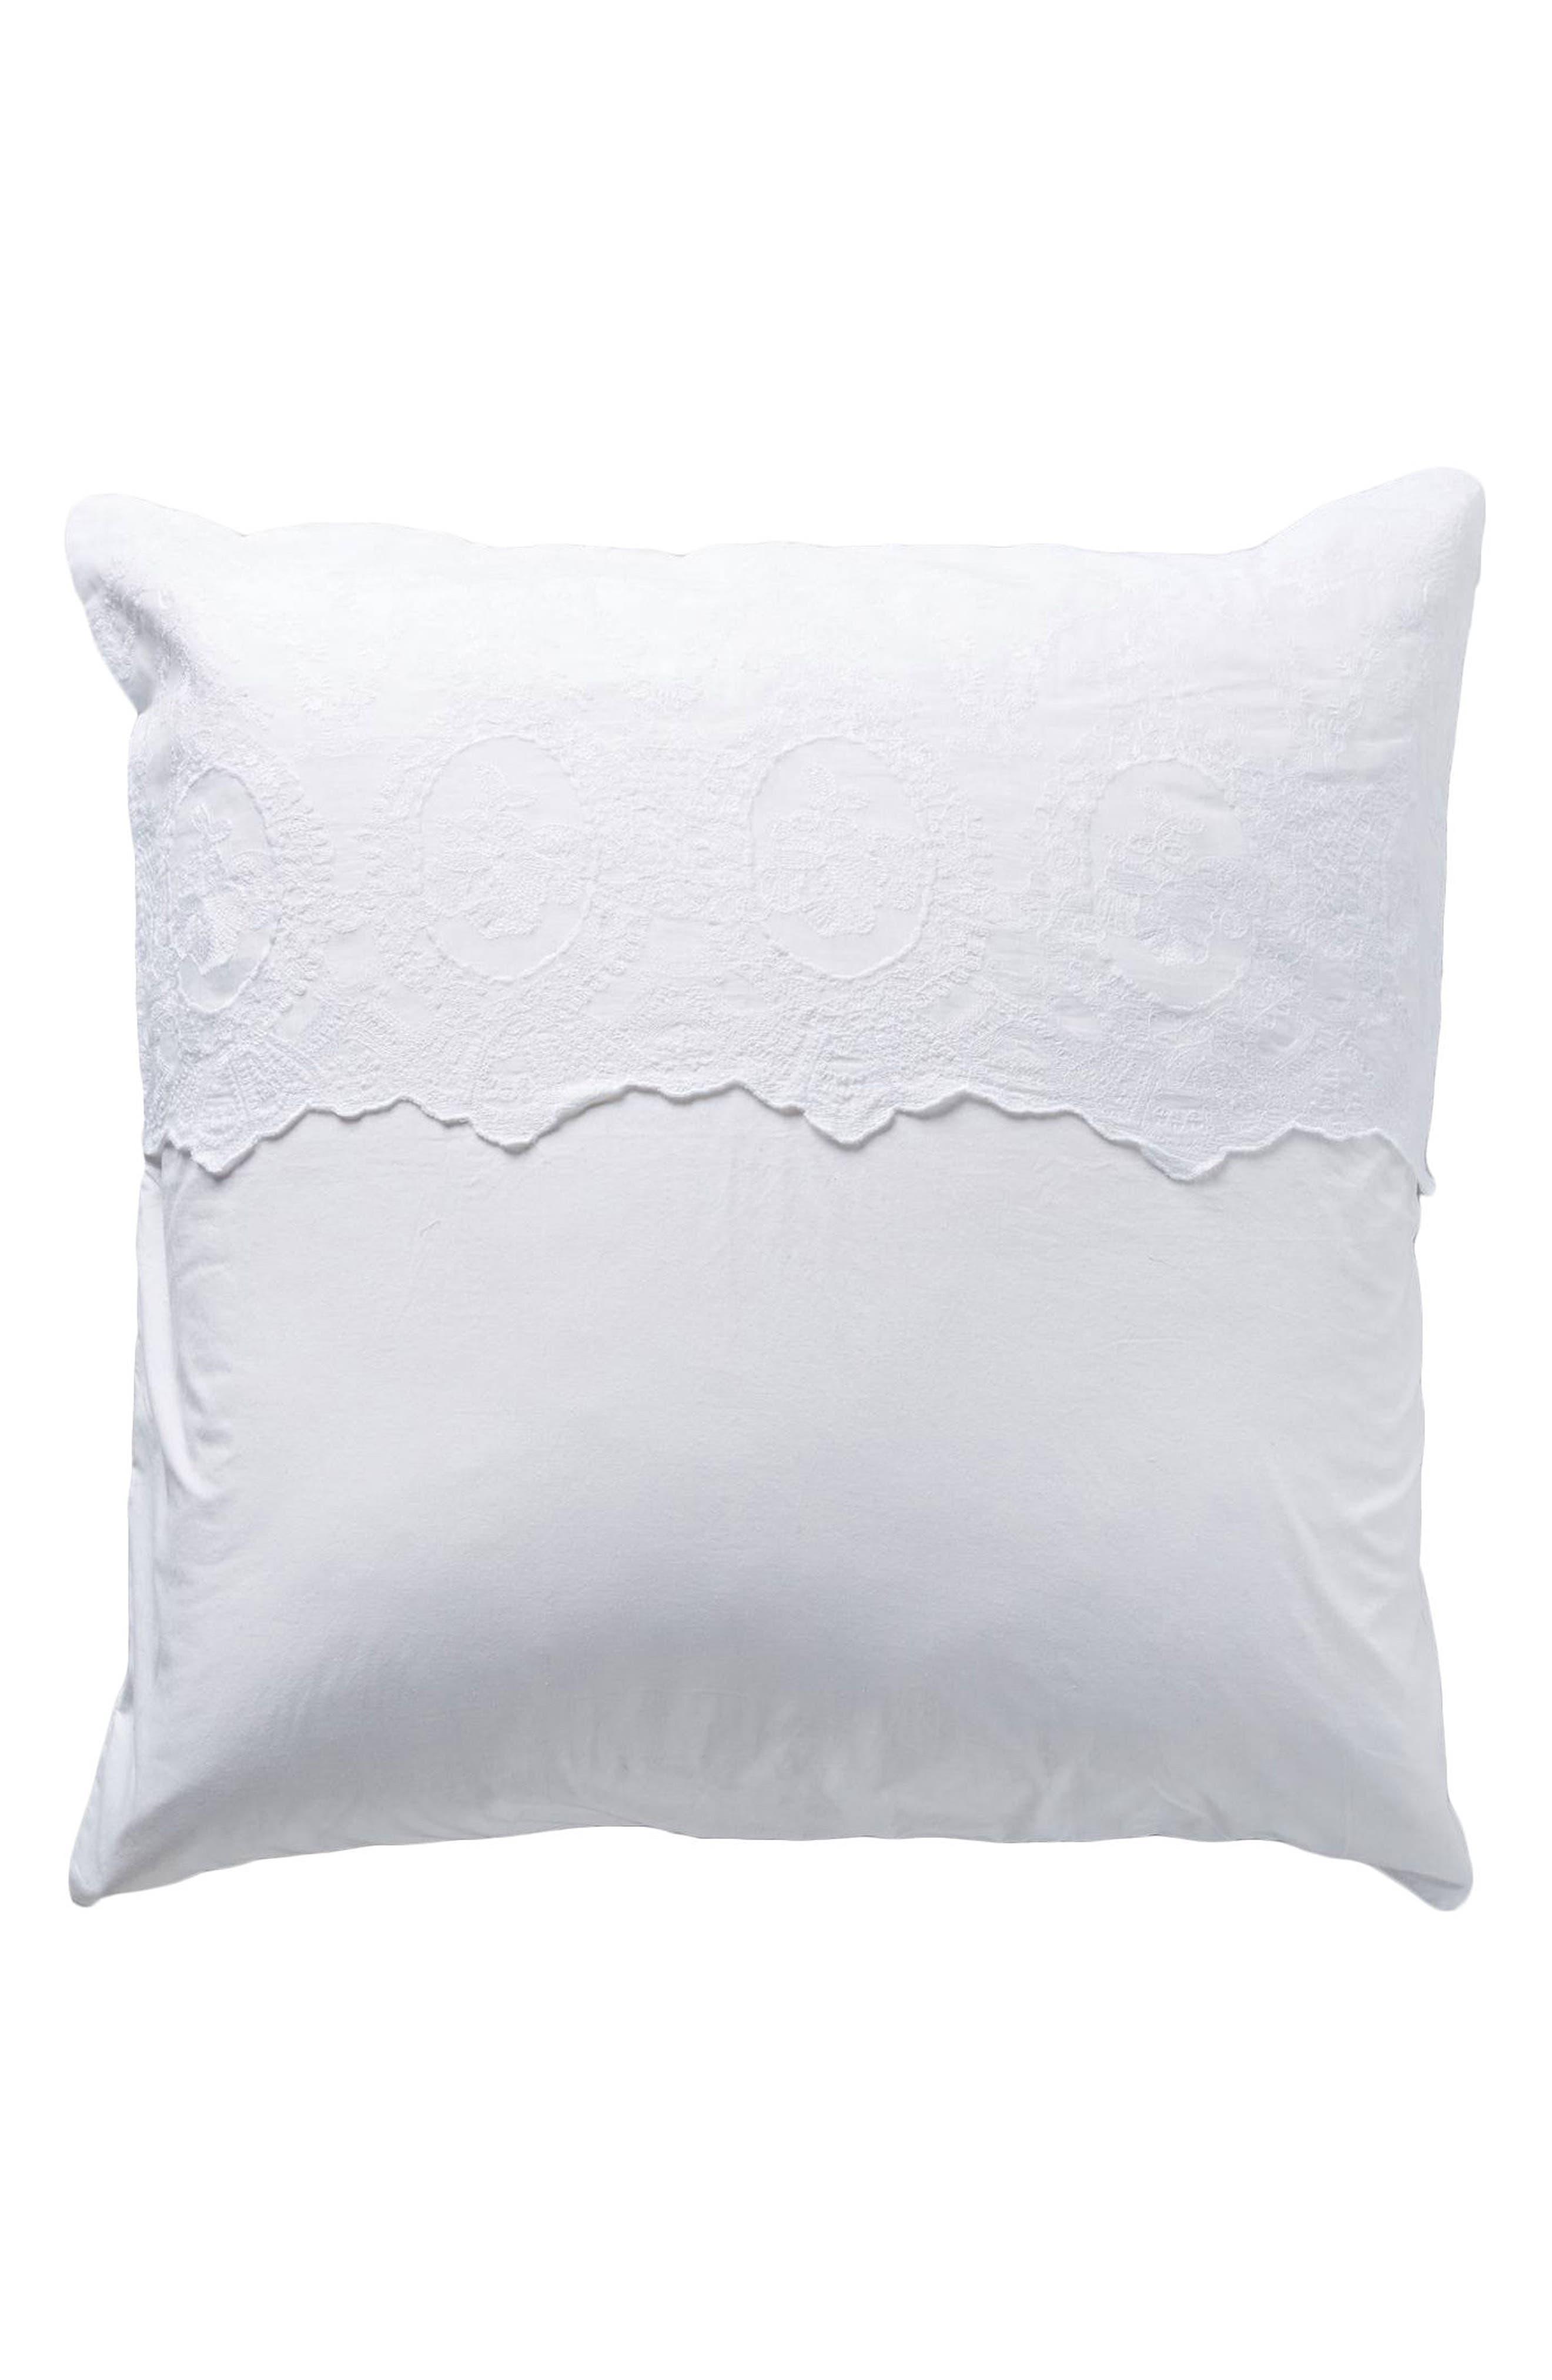 Grace Euro Sham,                         Main,                         color, White